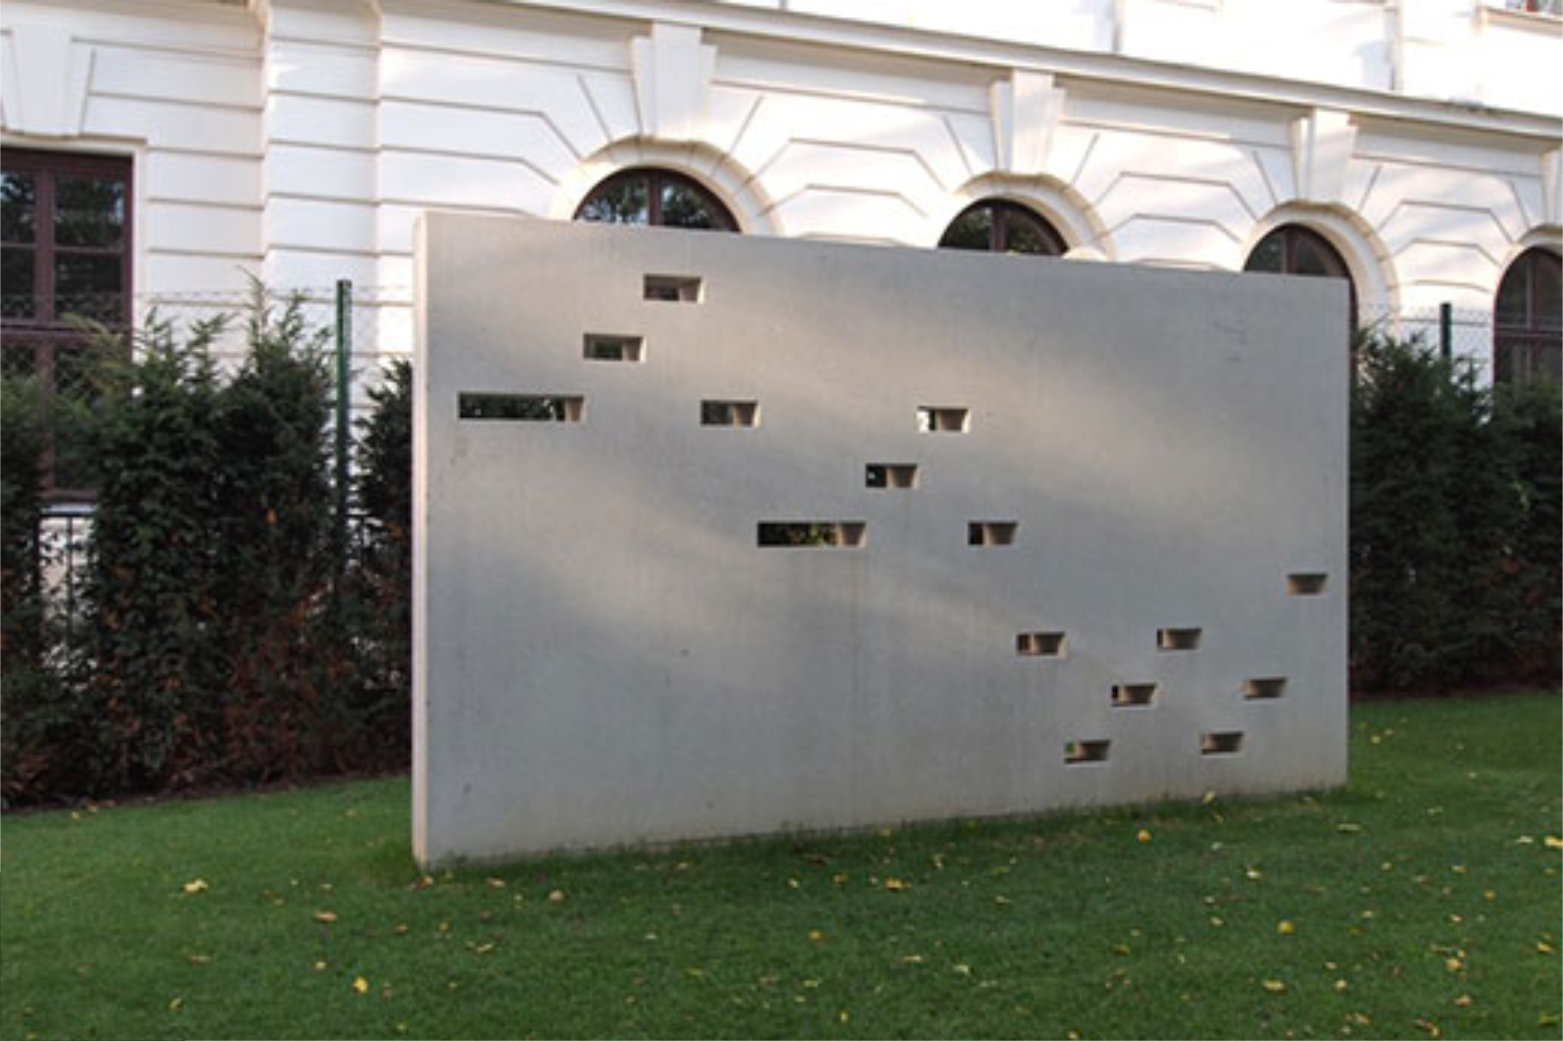 Josef Lehner GmbH Partitur aus Beton